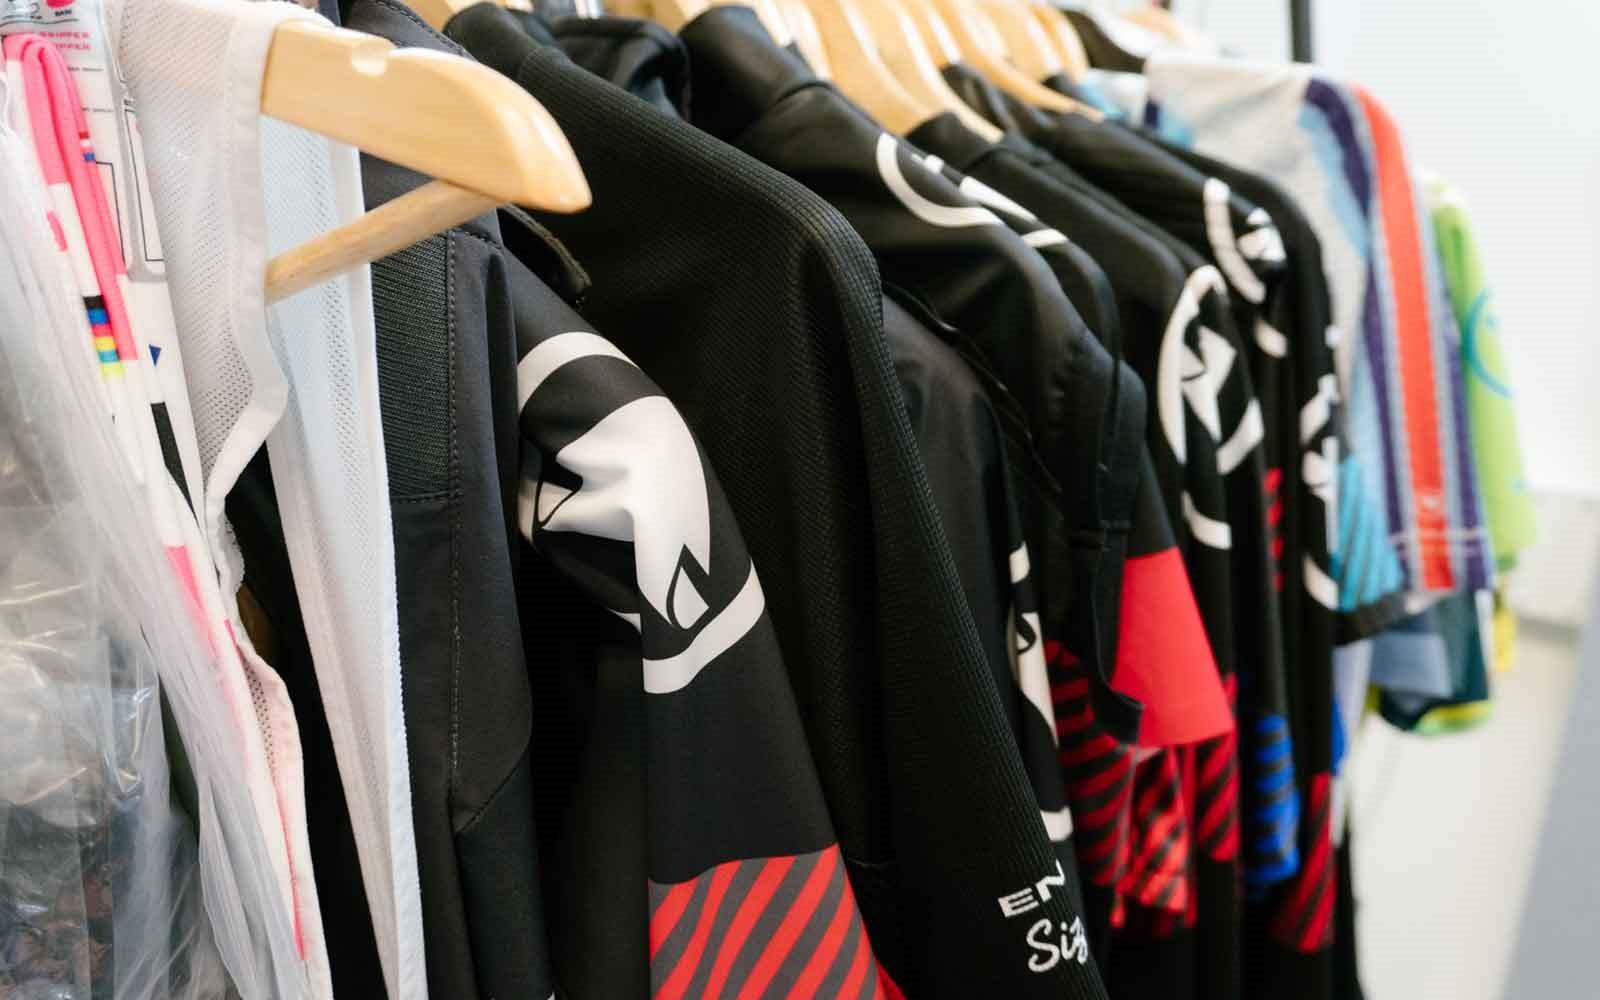 Endura-Clothing-Rack-1